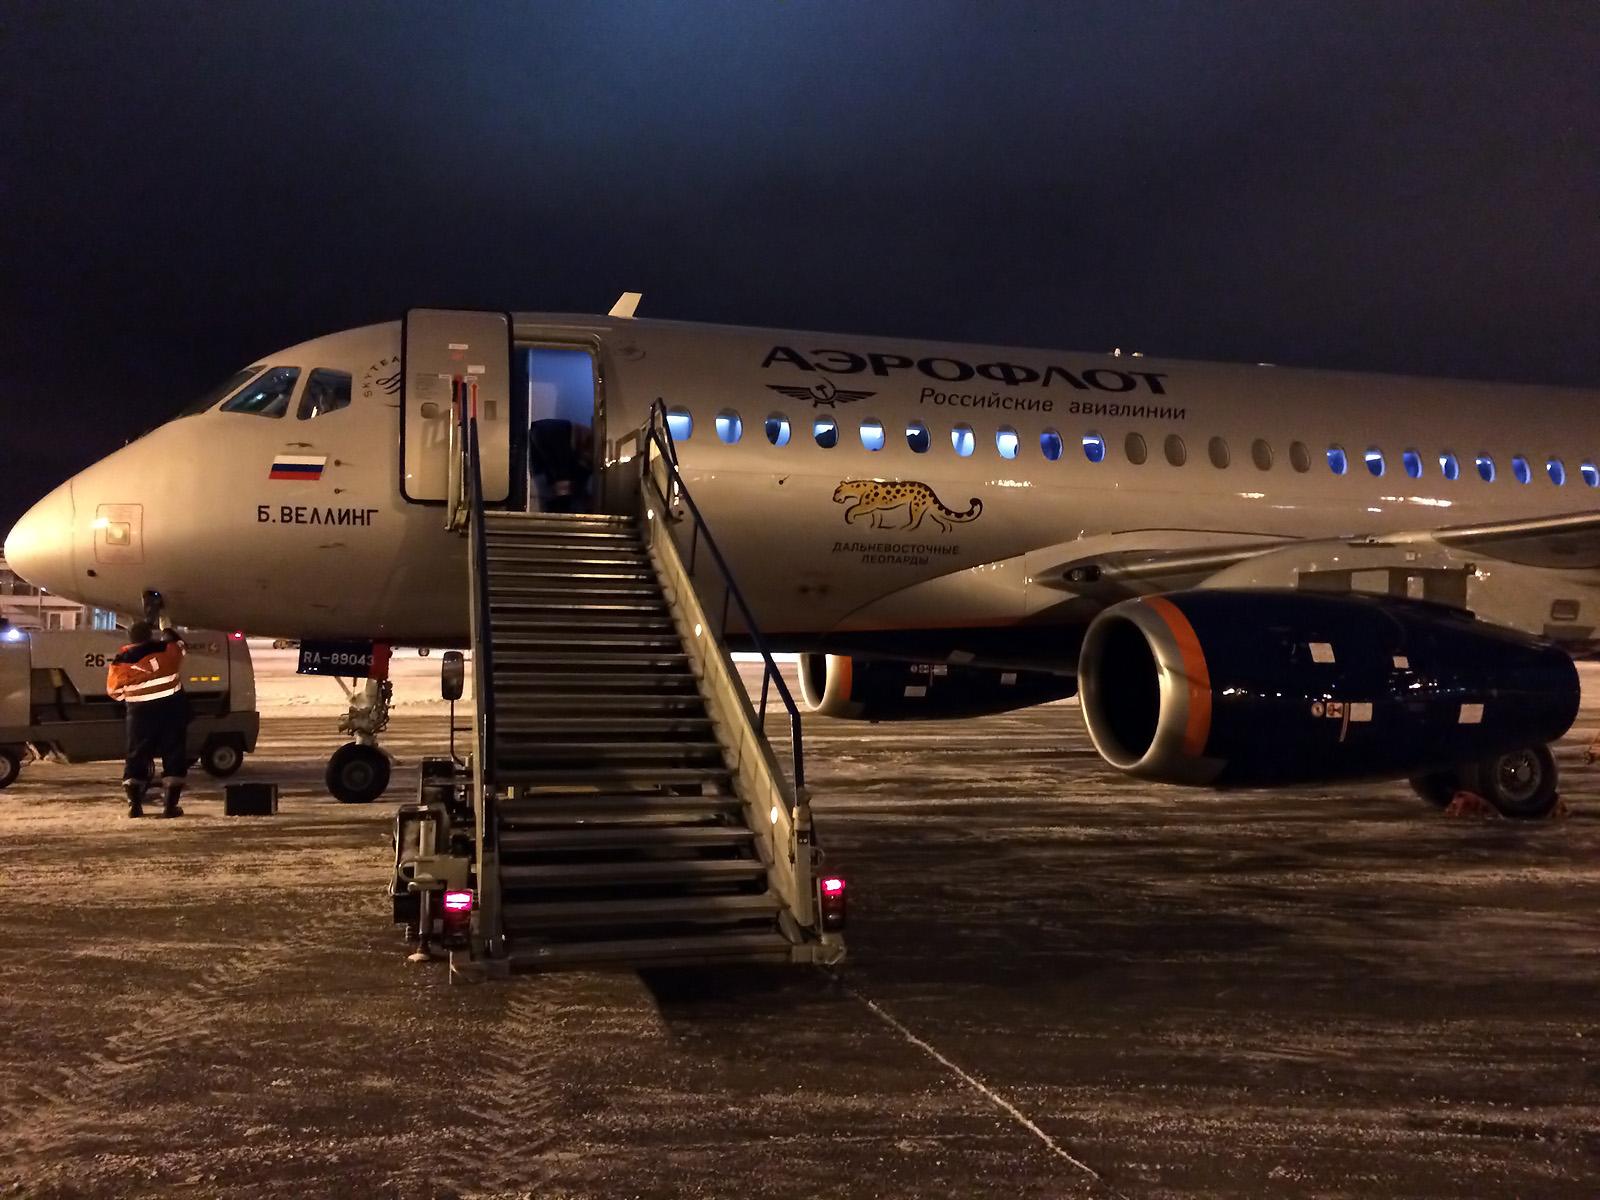 Sukhoi Superjet-100 RA-89043 (95074)